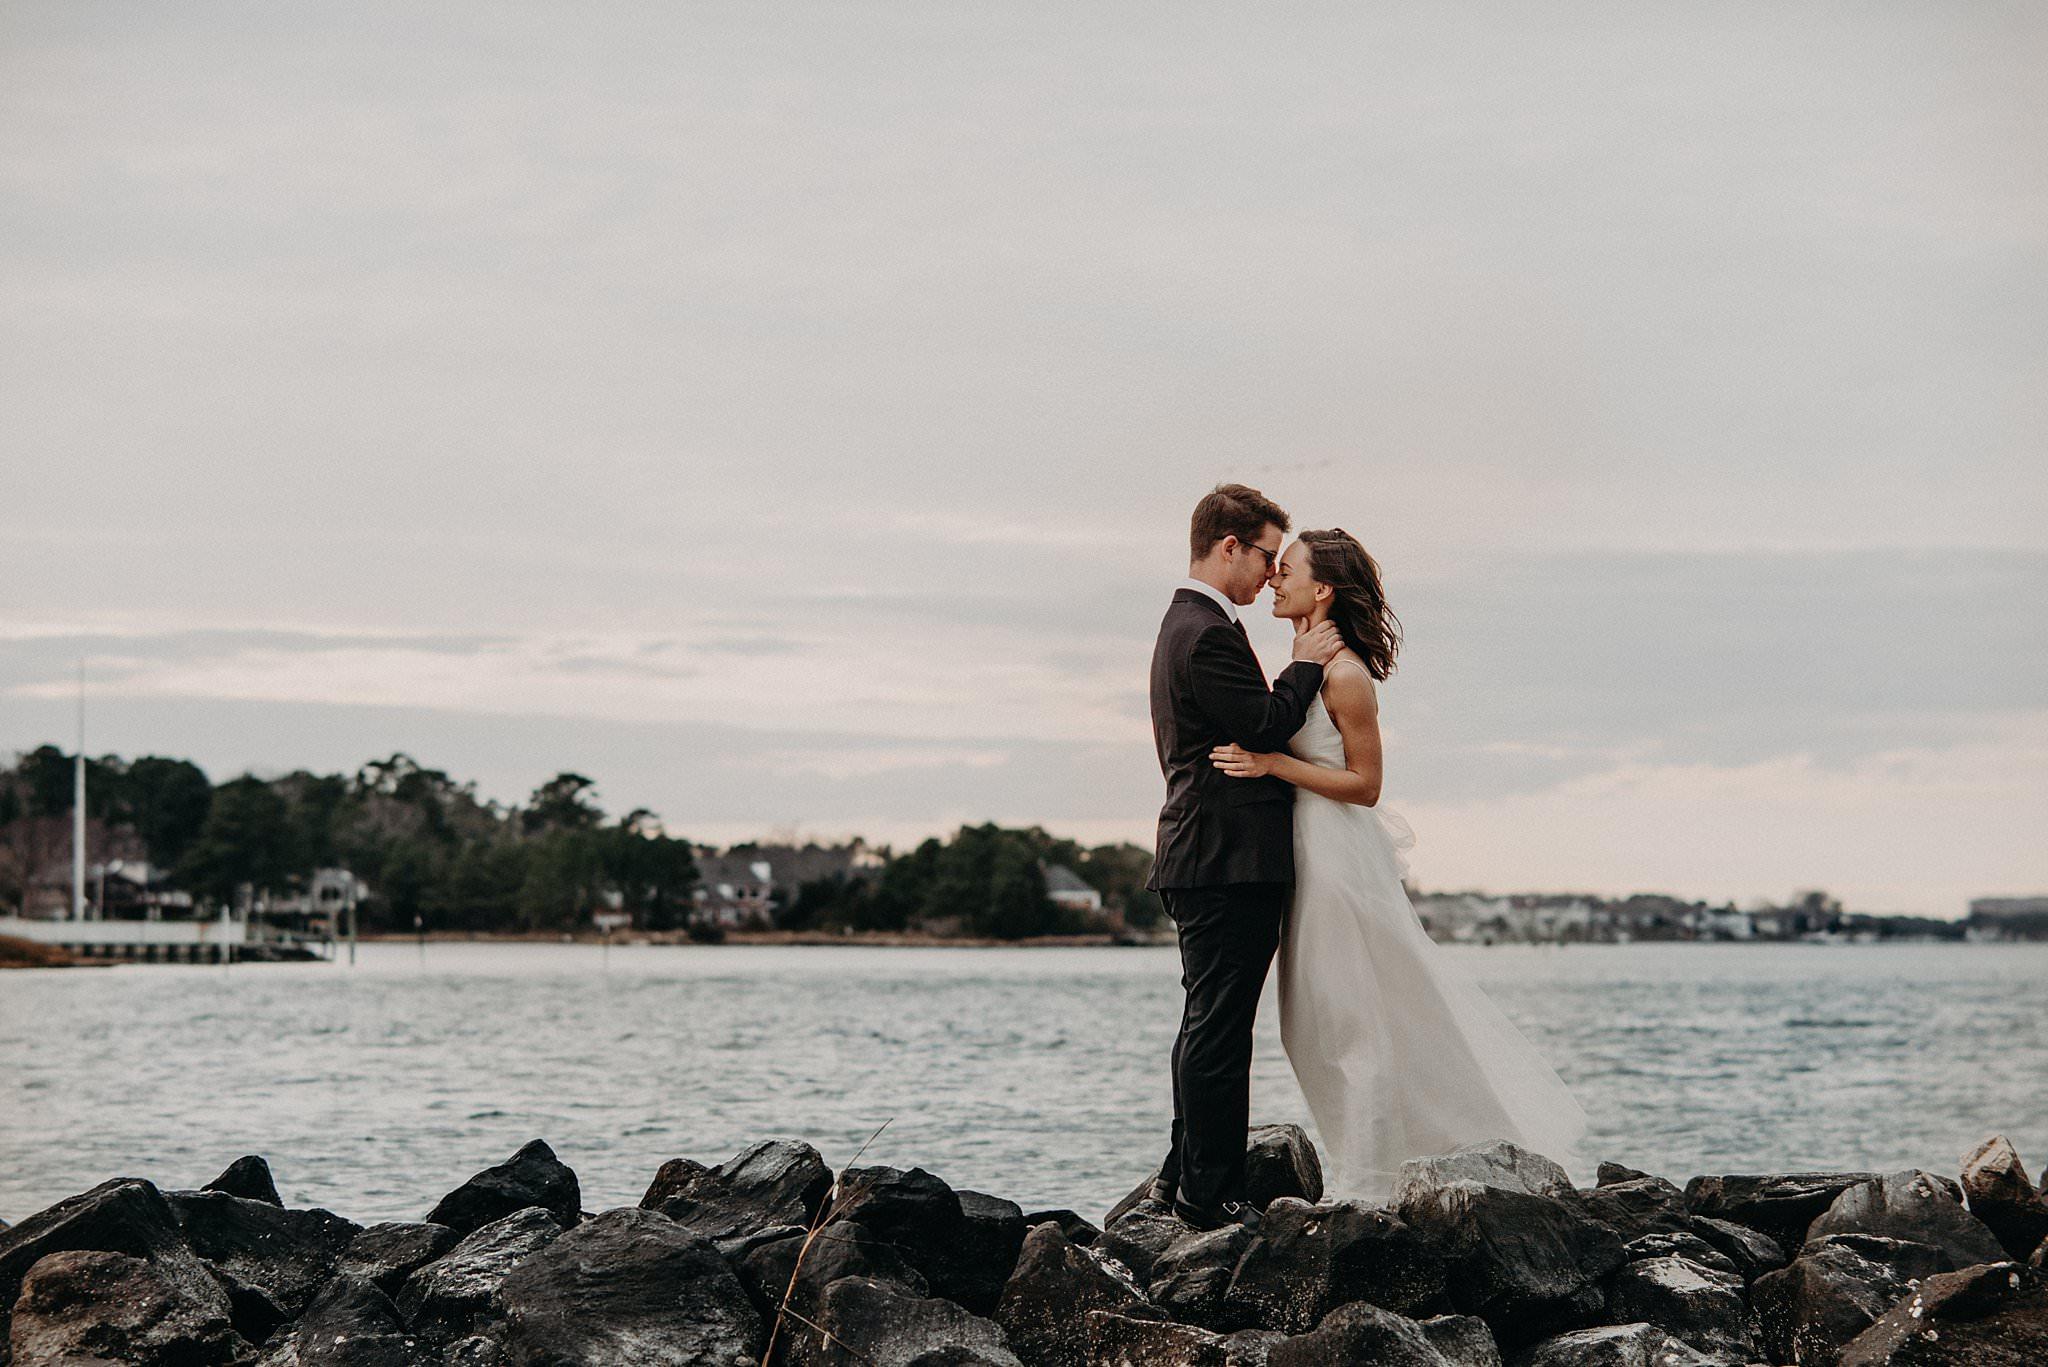 Bride-Groom-on-rocky-shoreline-Norfolk-VA-elopement-photos-melissa-bliss-photography.jpg